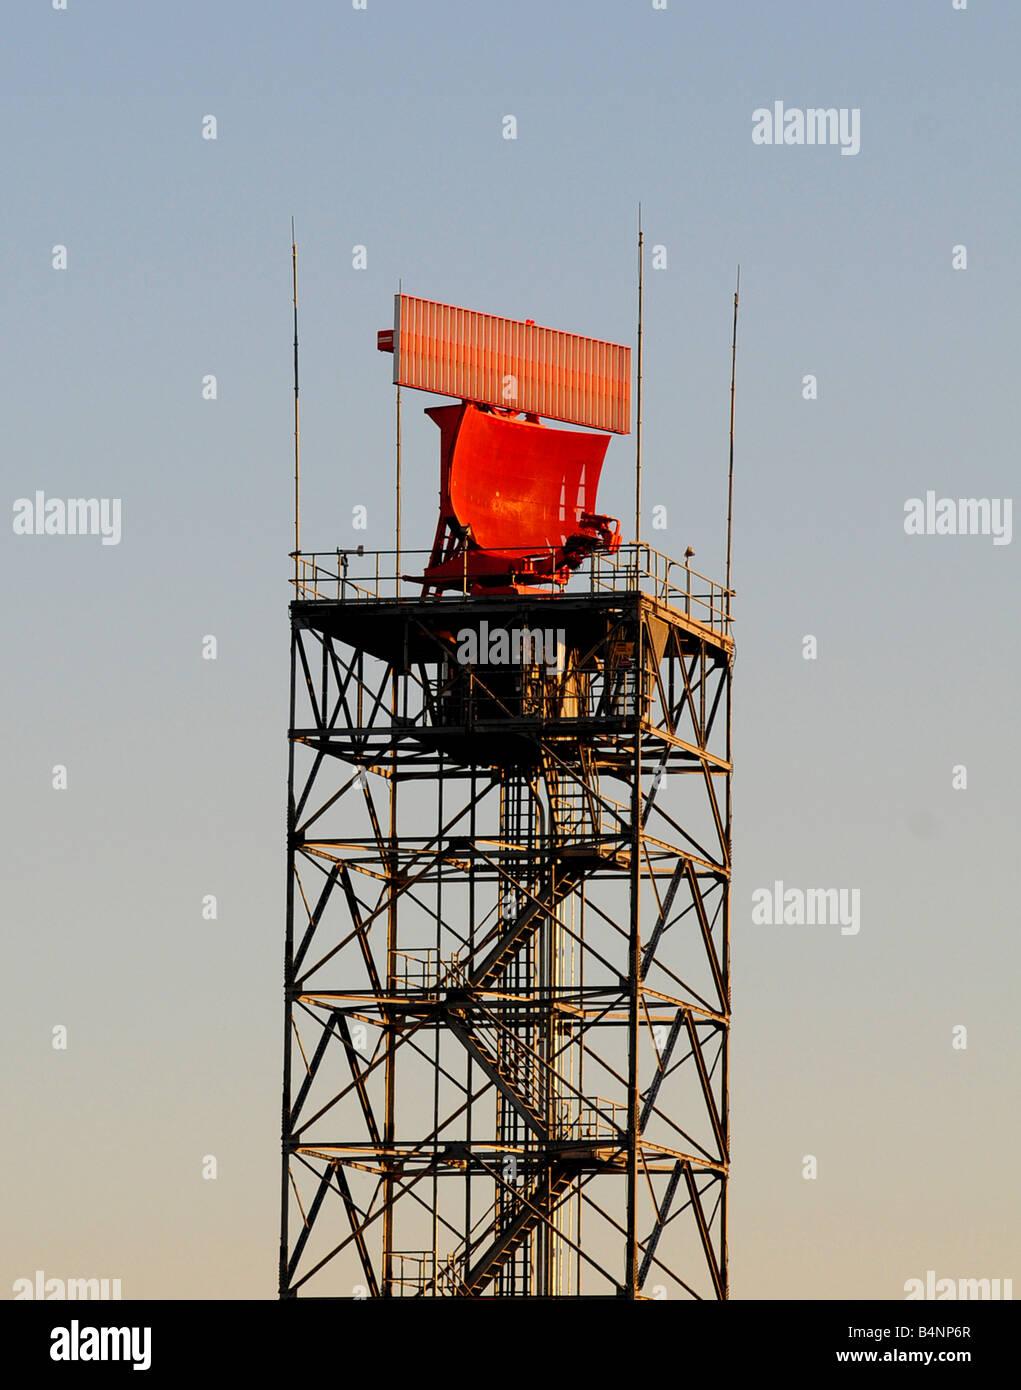 A radar tower at an airport - Stock Image